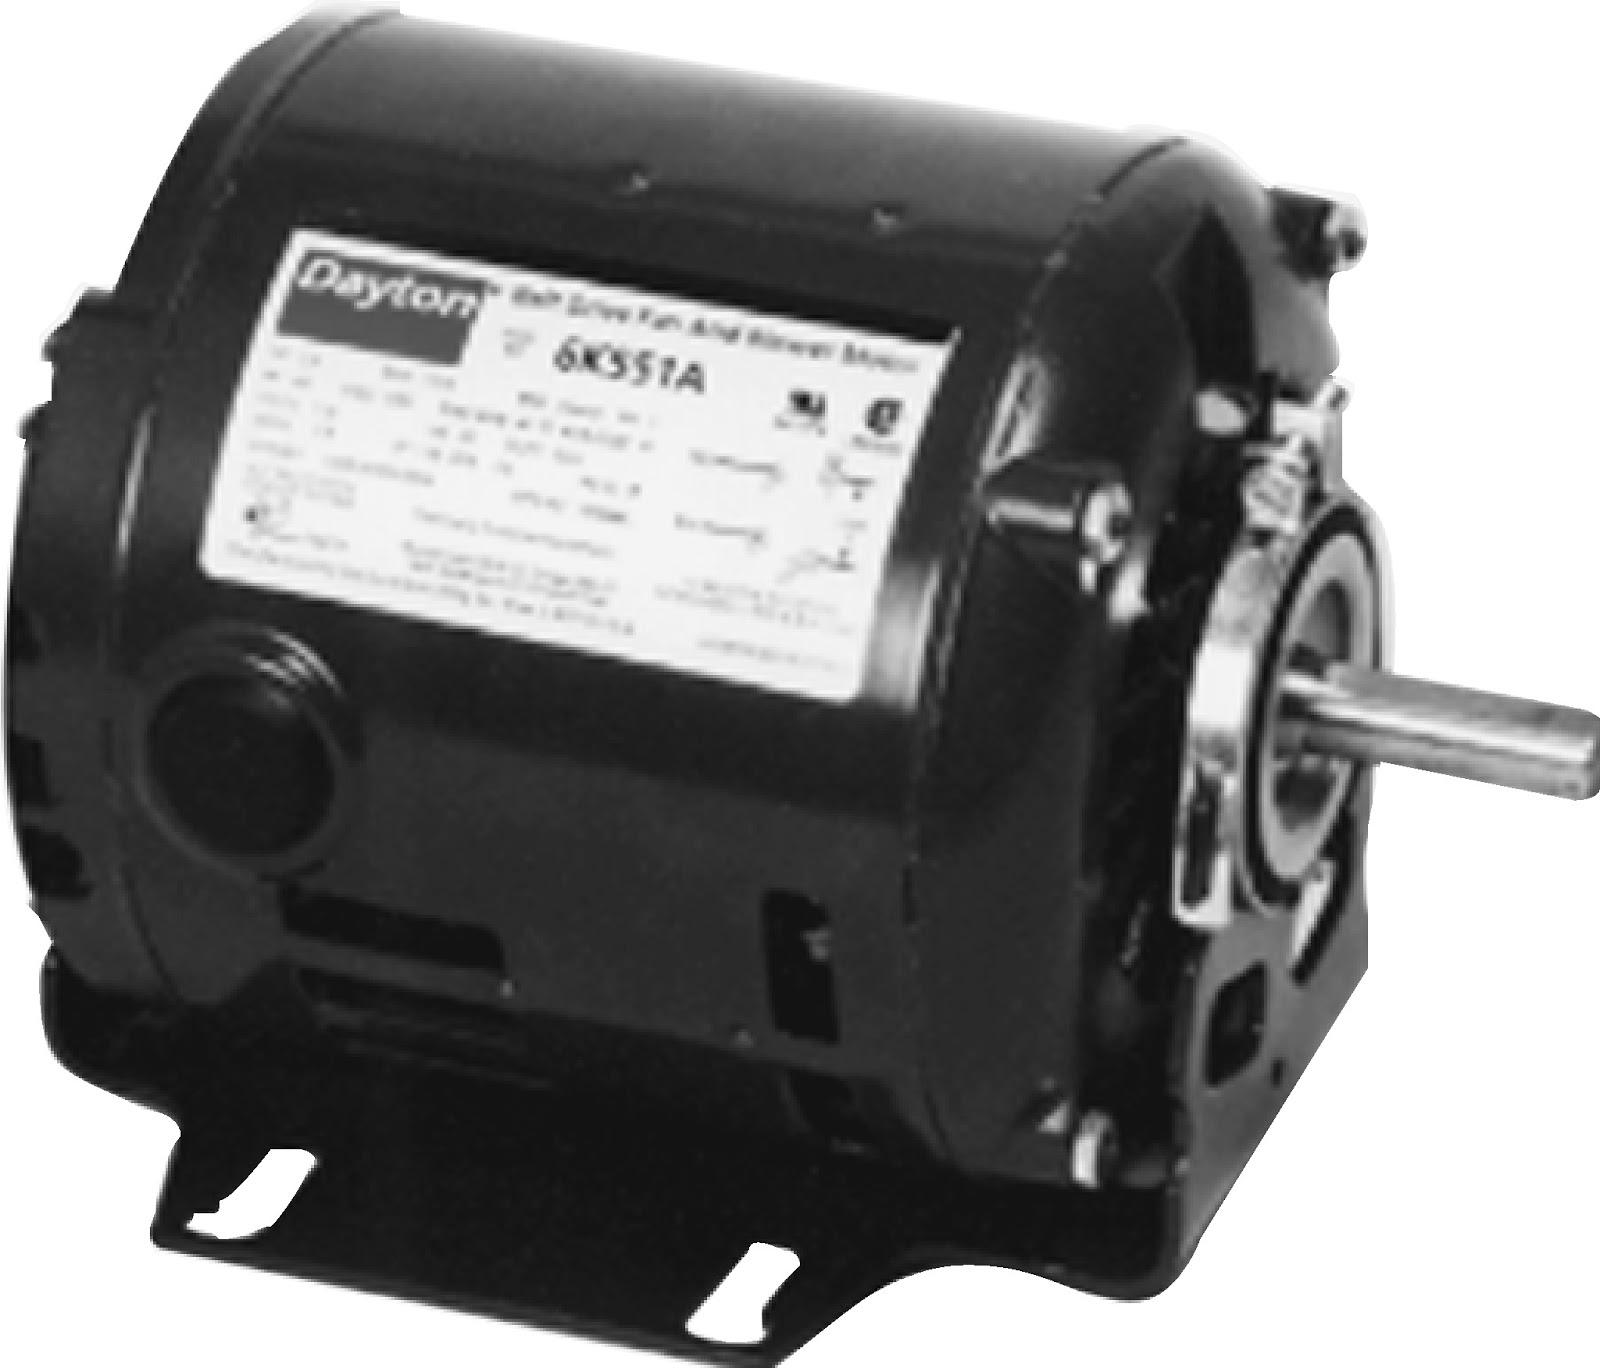 Split Phase Induction Motor Wiring Diagram Redarc Bcdc1220 Ac ~ Kit Picture